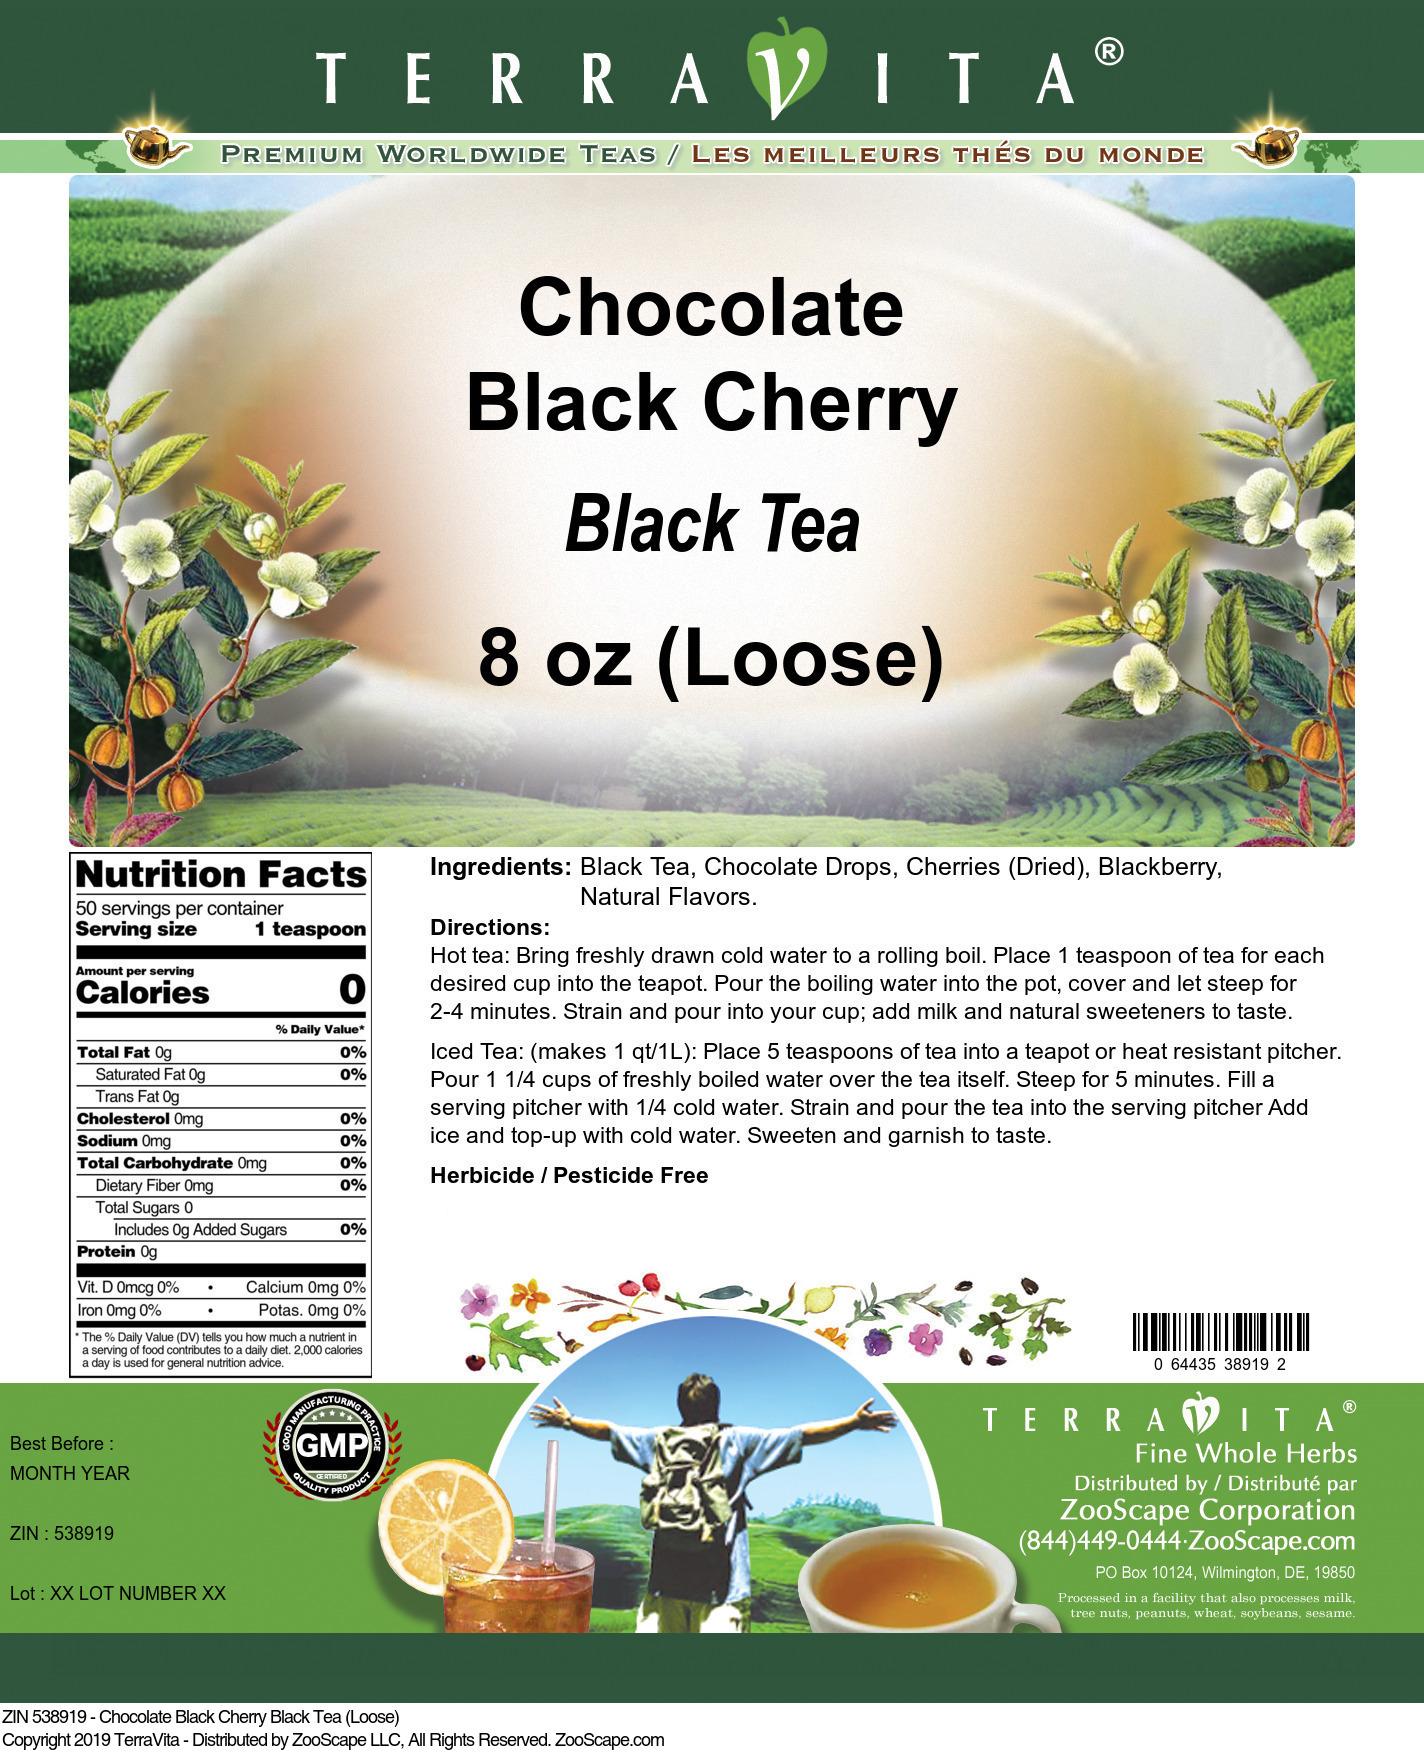 Chocolate Black Cherry Black Tea